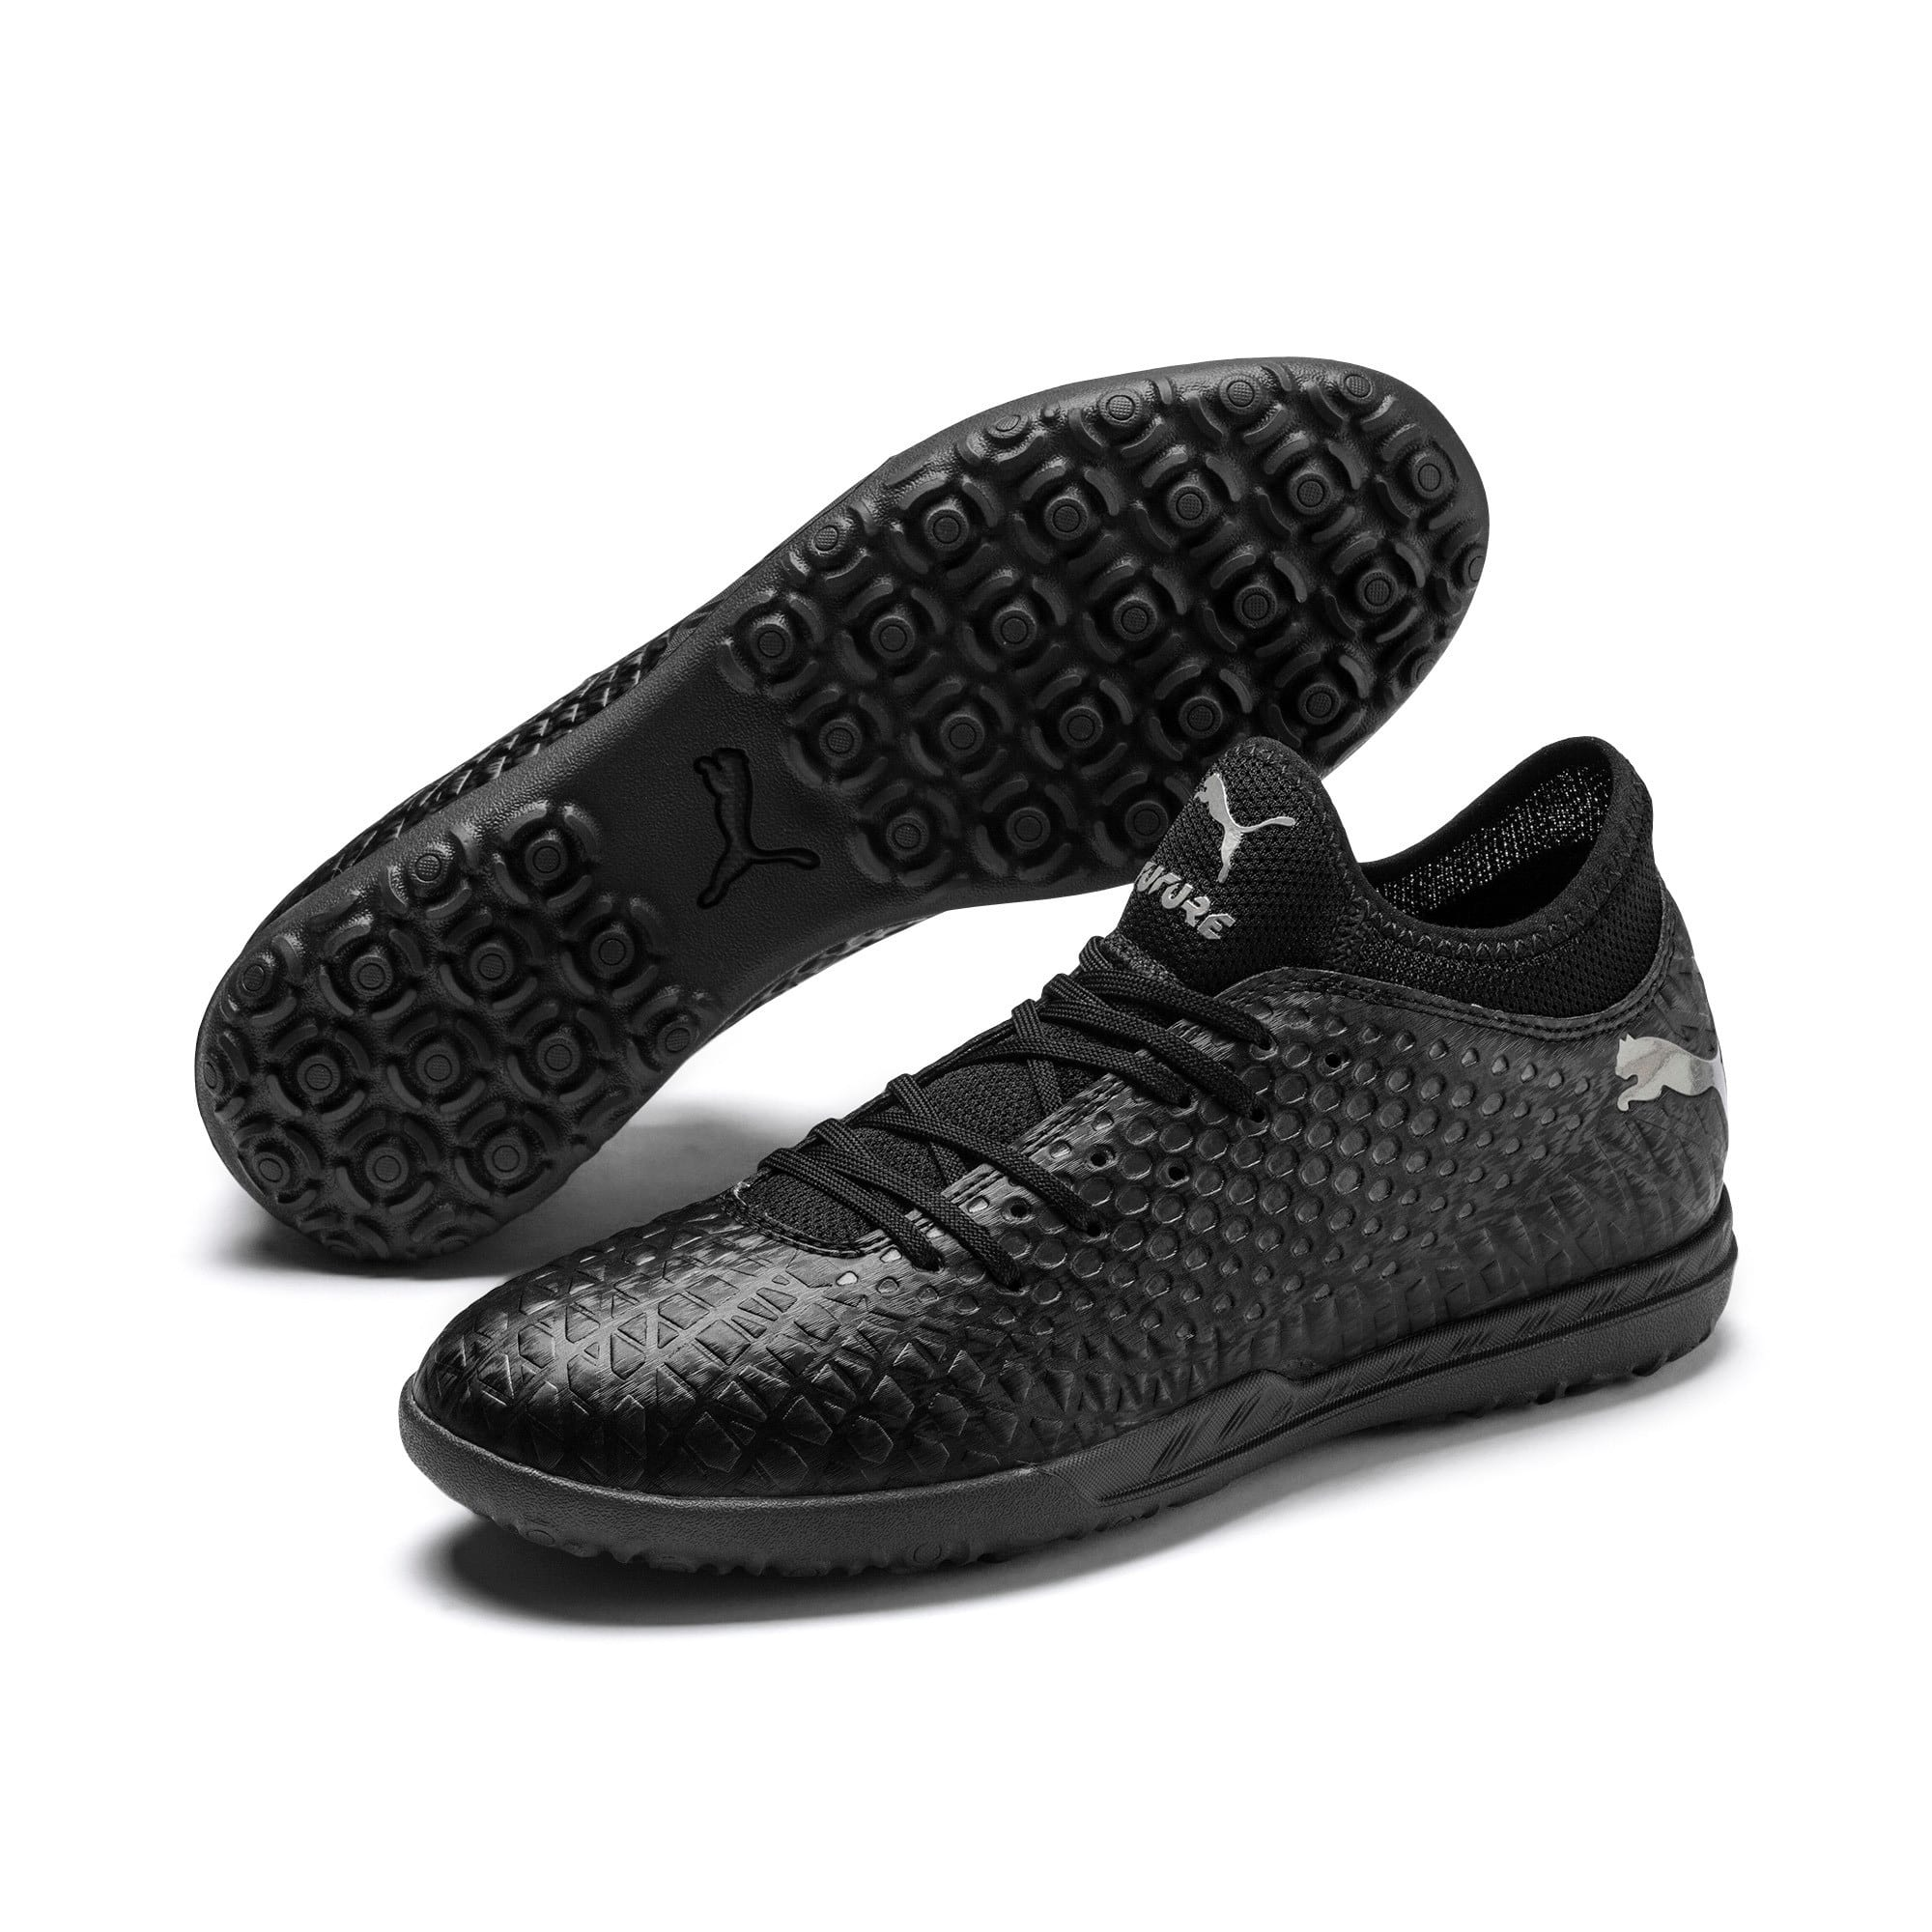 Thumbnail 3 of FUTURE 4.4 TT Men's Football Boots, Black-Black-Puma Aged Silver, medium